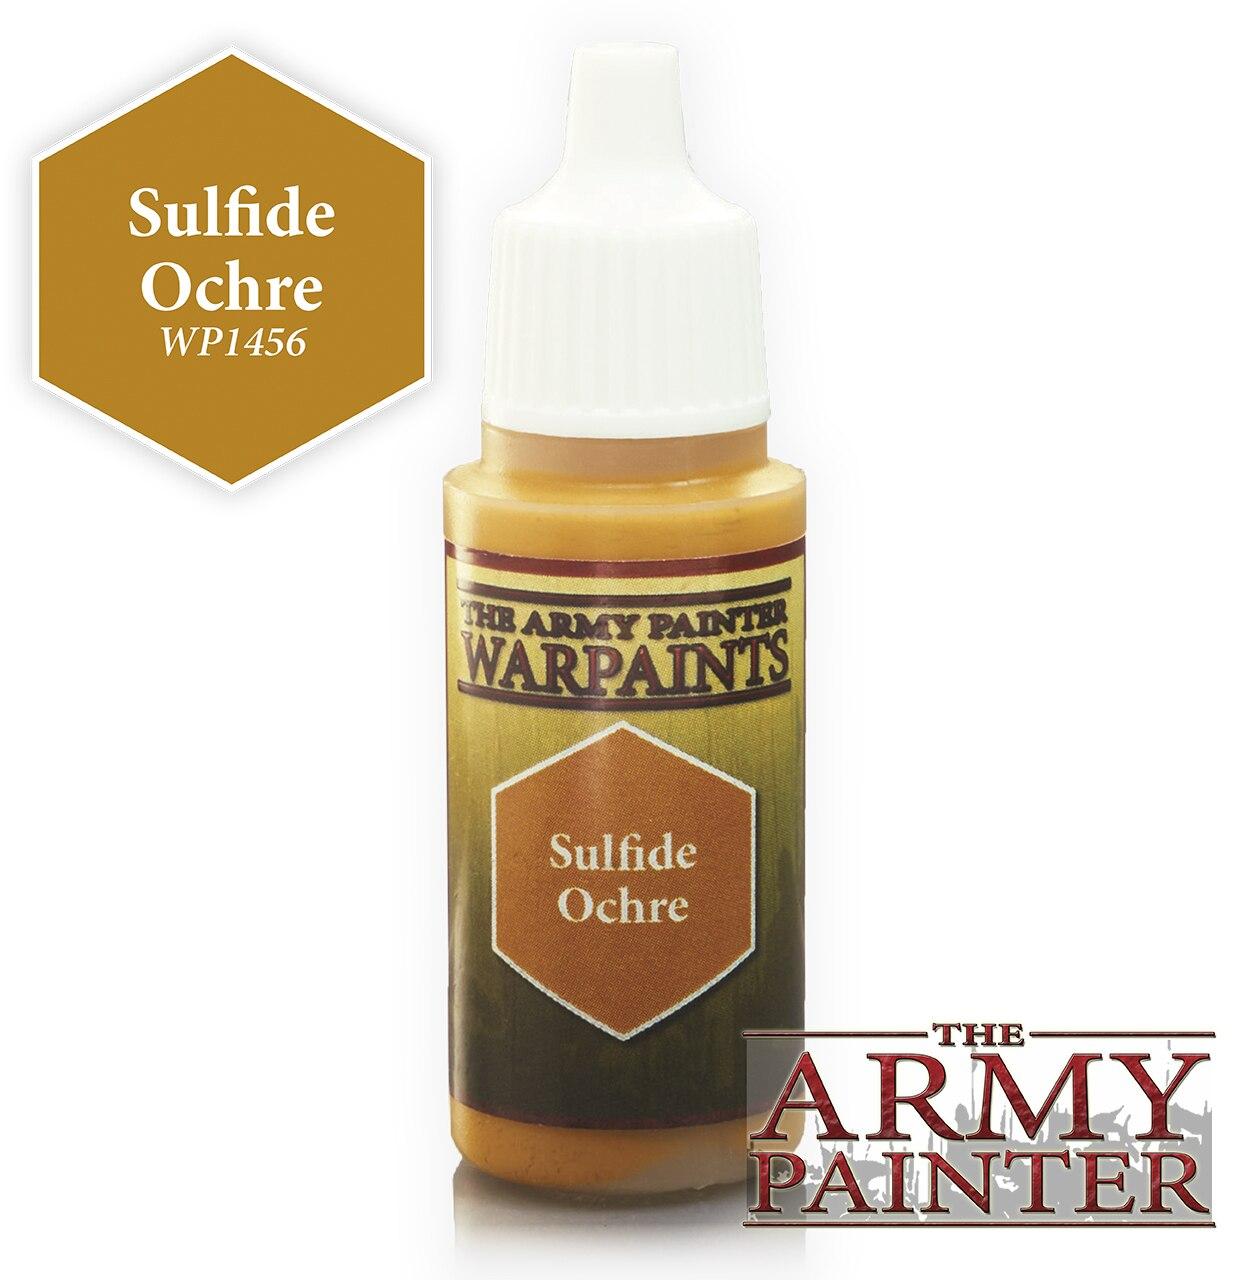 Army Painter Warpaint - Sulfide Ochre